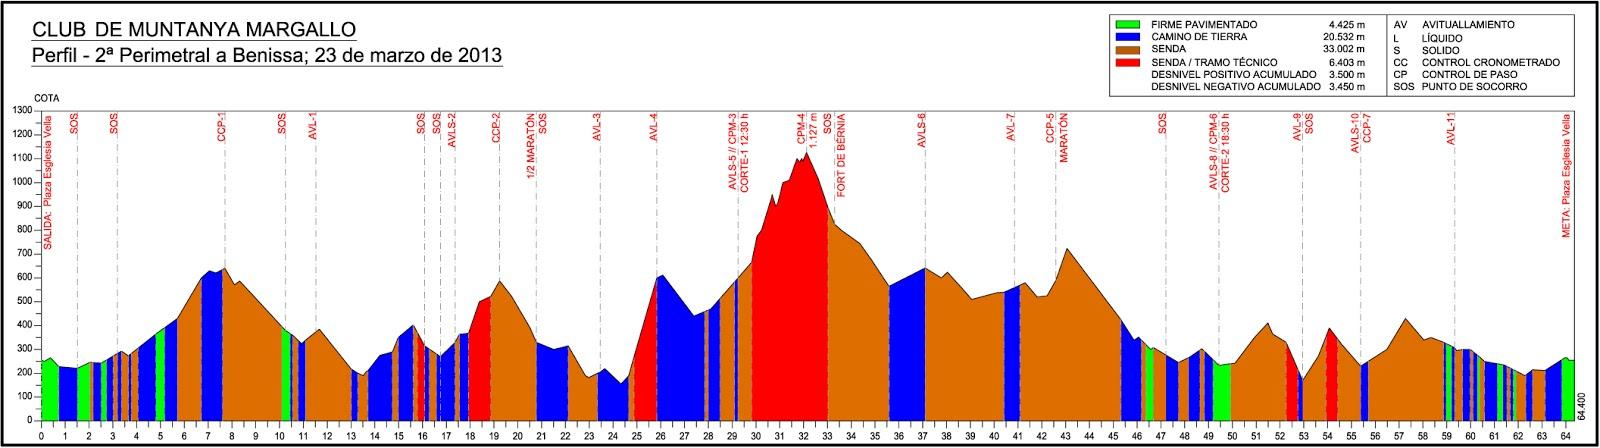 perfil-perimetral-benissa-2013